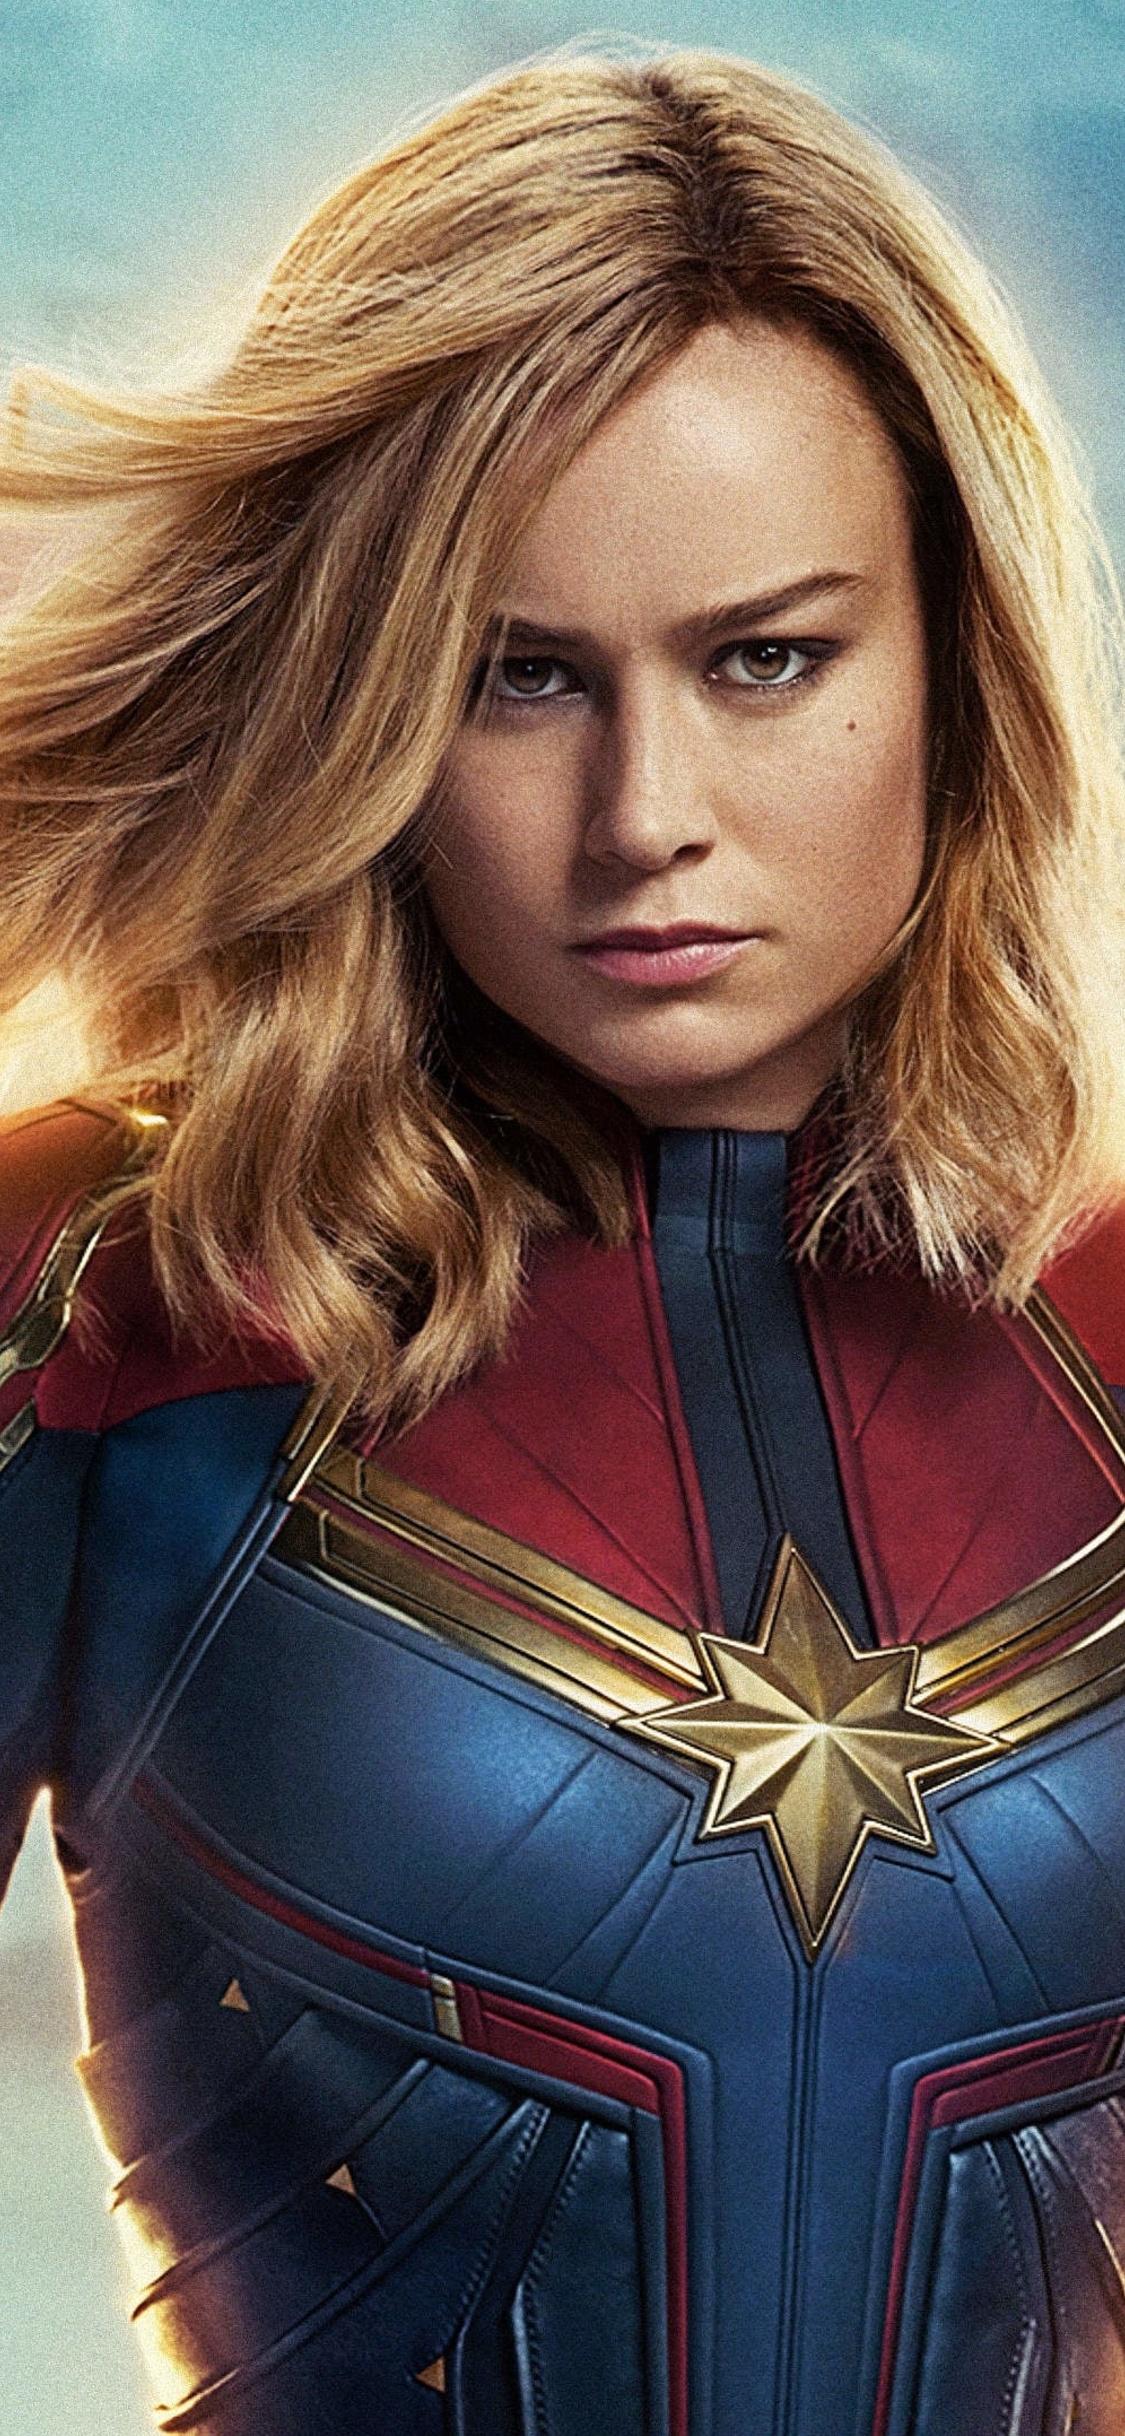 1125x2436 Captain Marvel Movie 4k 2019 Iphone XS,Iphone 10 ...